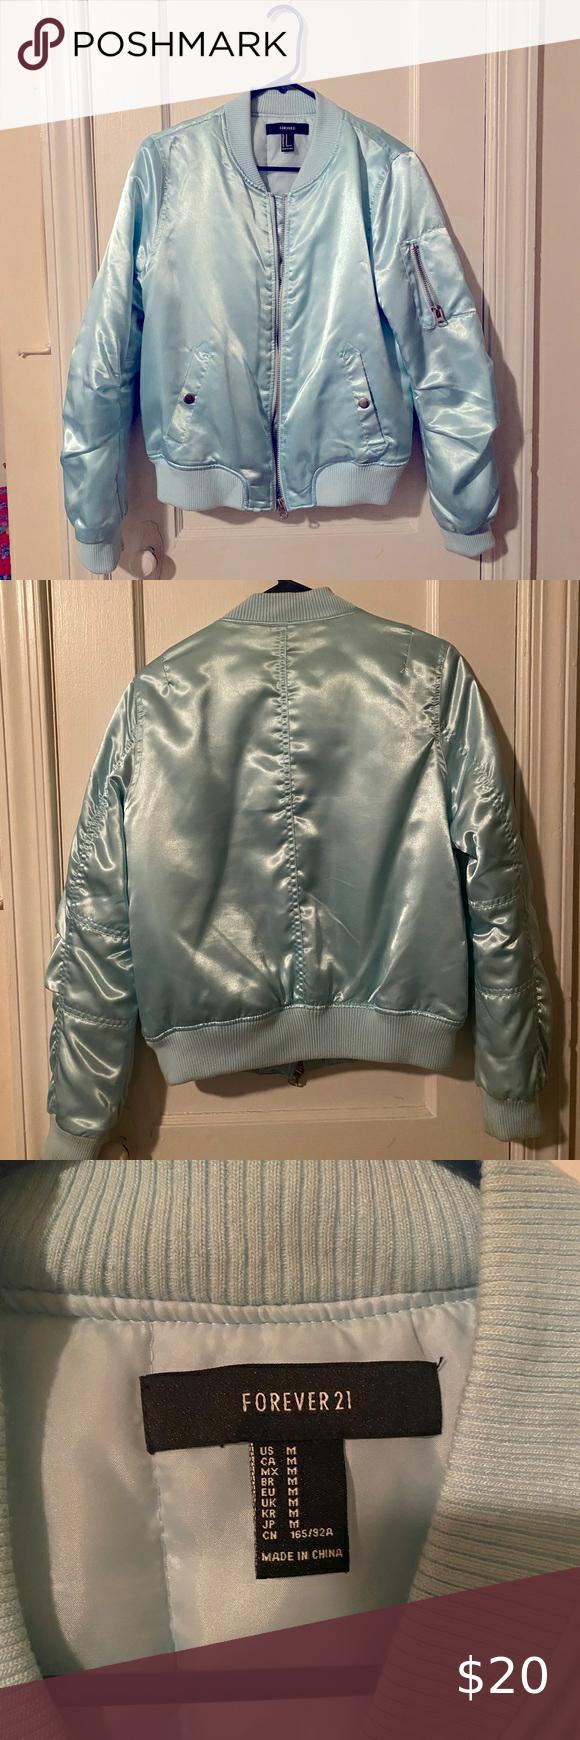 Powder Blue Bomber Jacket Super Pretty For Spring Blue Bomber Jacket Faux Leather Bomber Jacket Olive Green Bomber Jacket [ 1740 x 580 Pixel ]